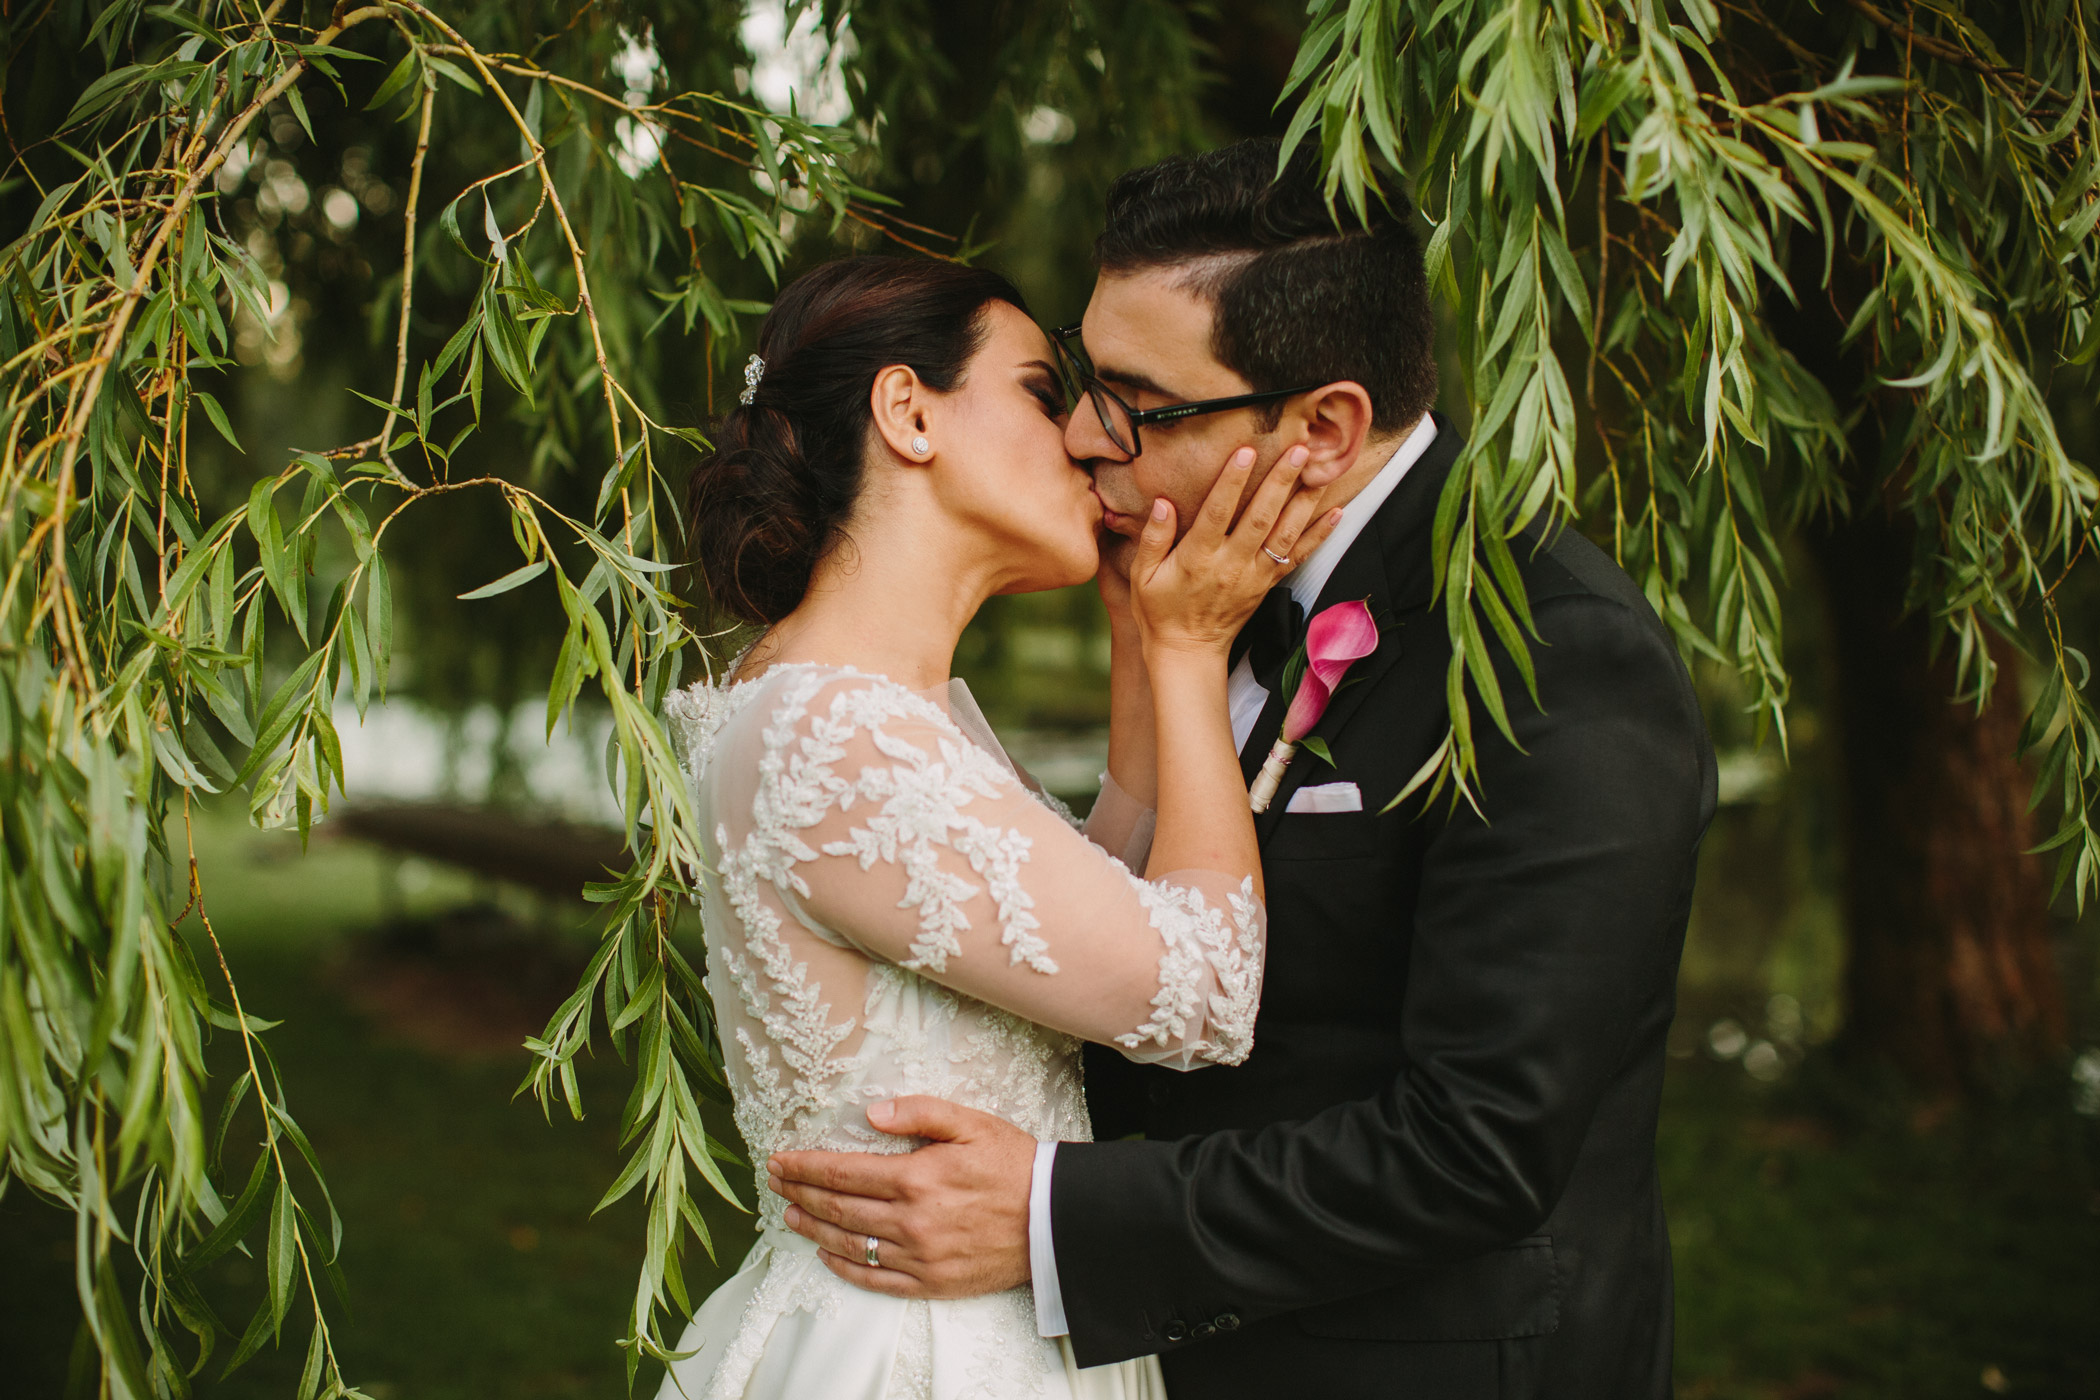 Vancouver Wedding Portrait under Willow Tree